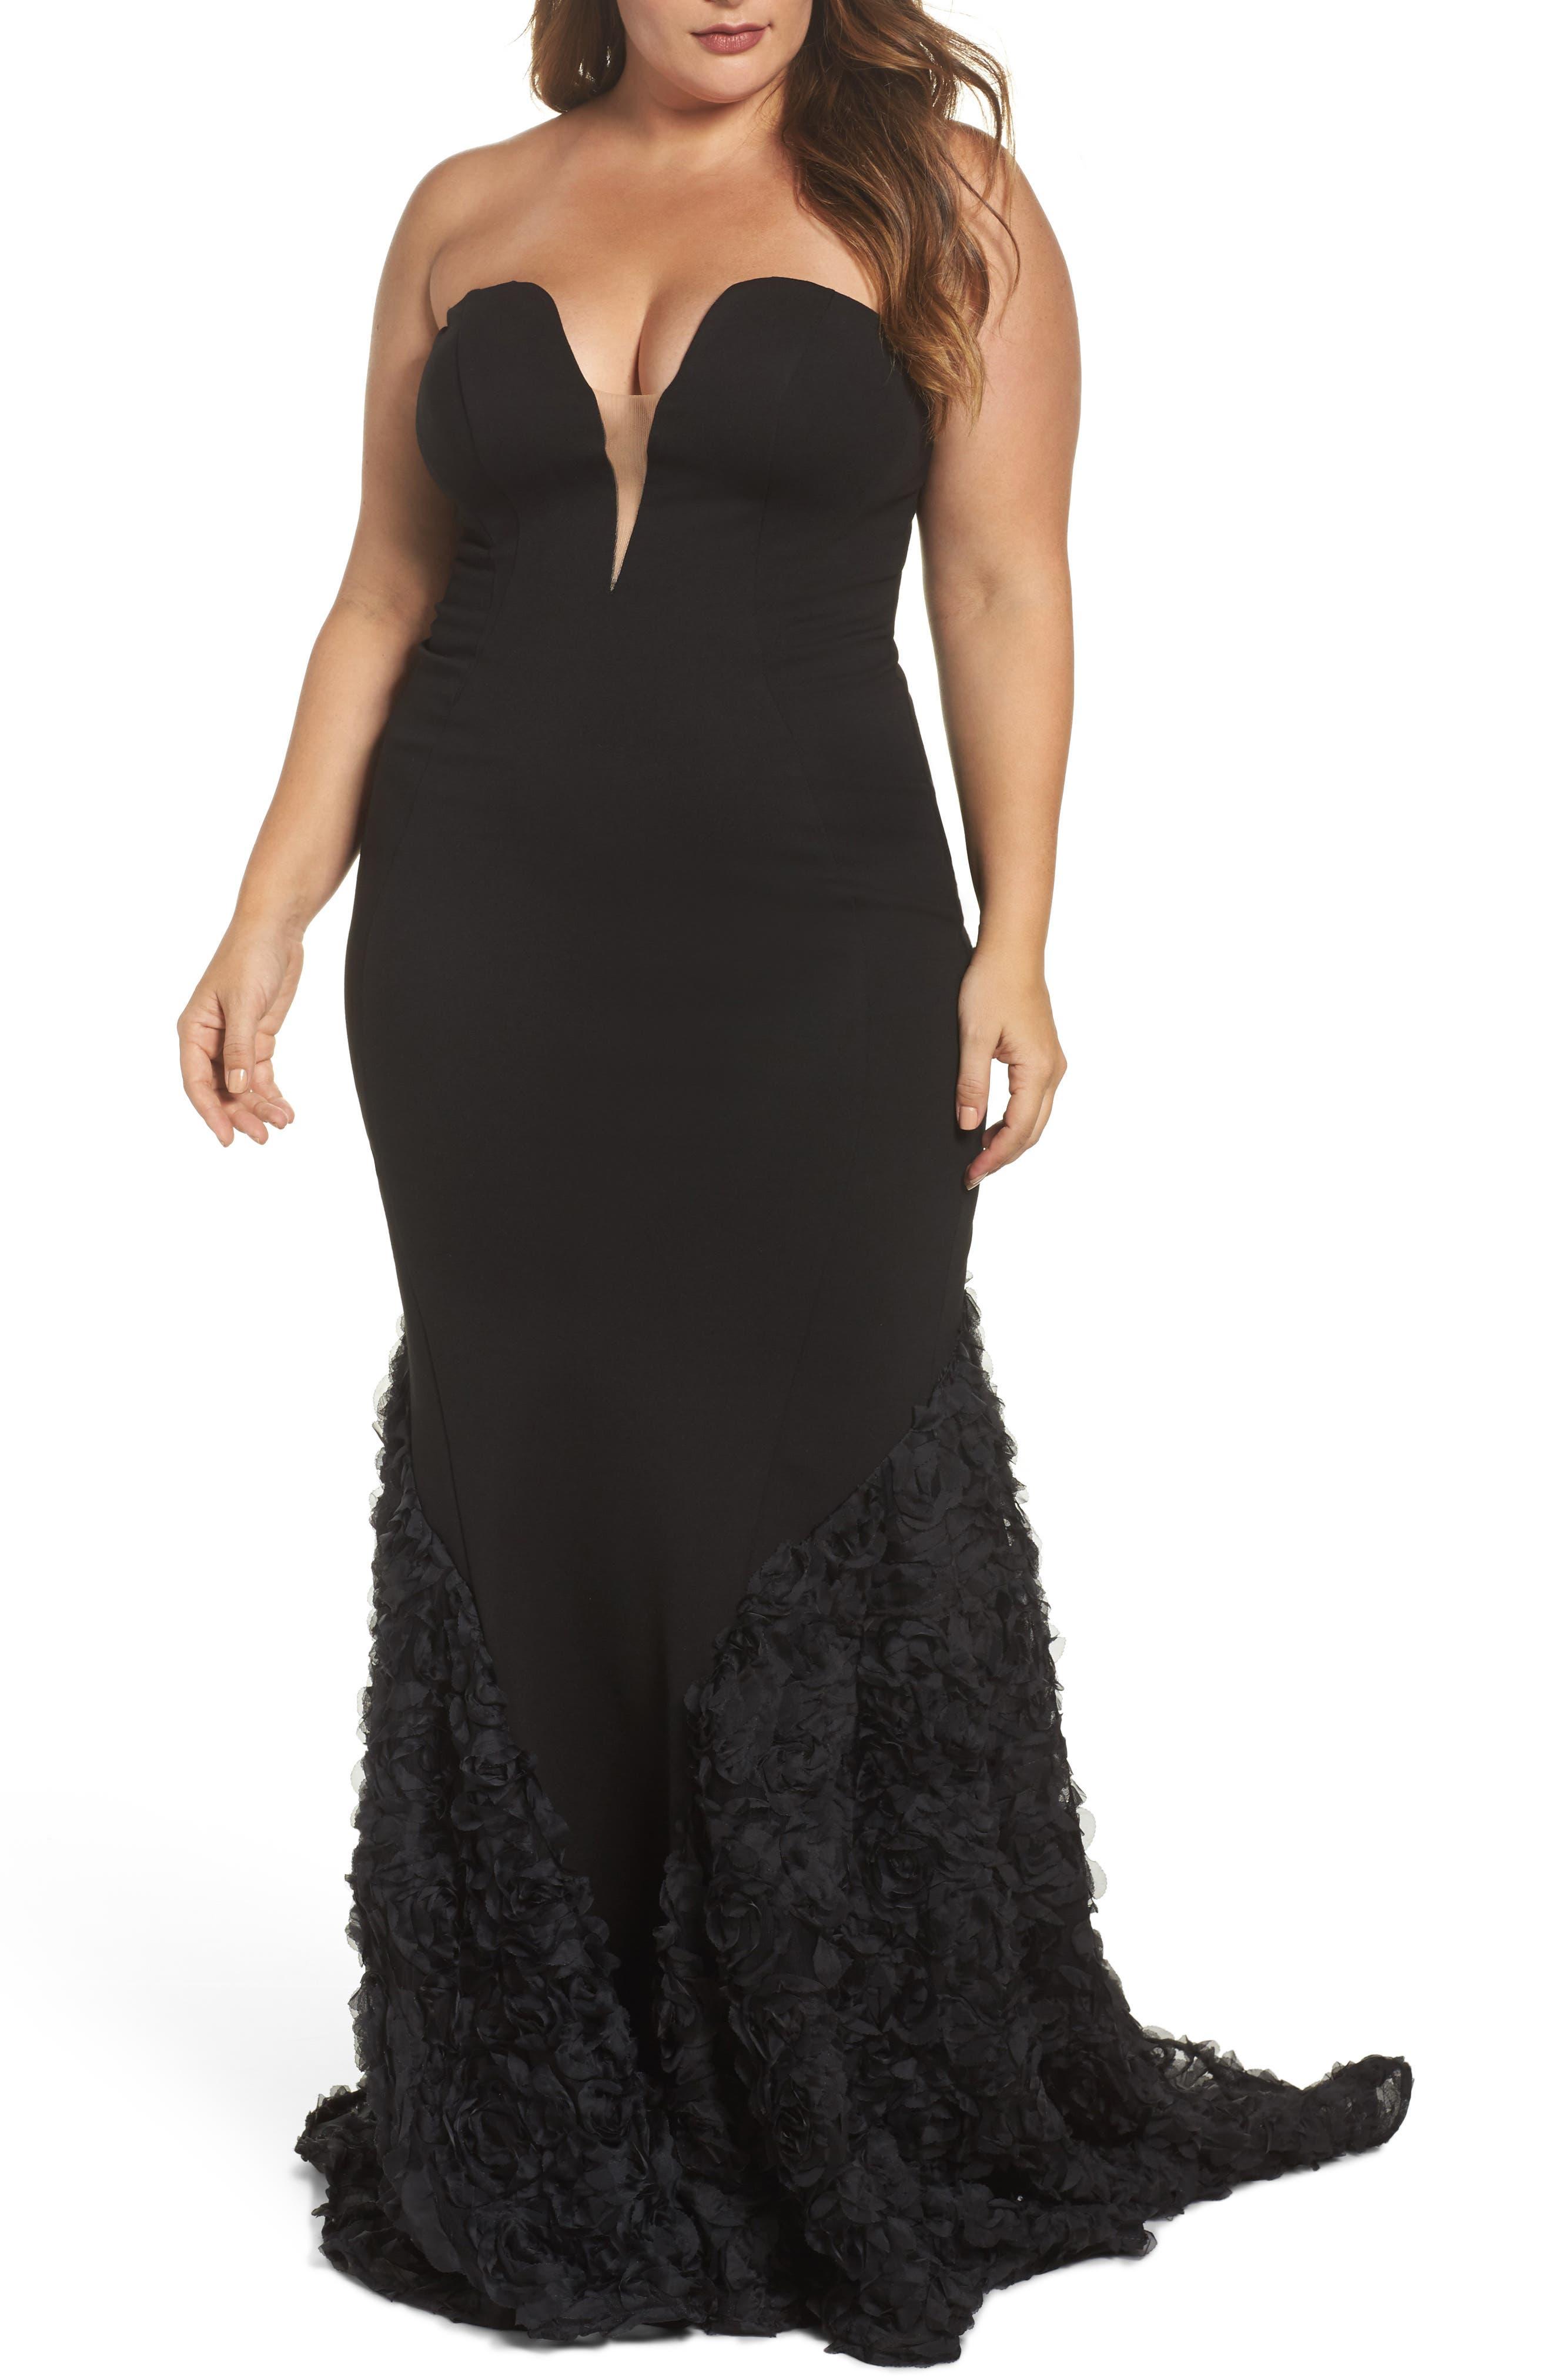 MAC DUGGAL, Strapless Bustier Rosette Gown, Main thumbnail 1, color, BLACK